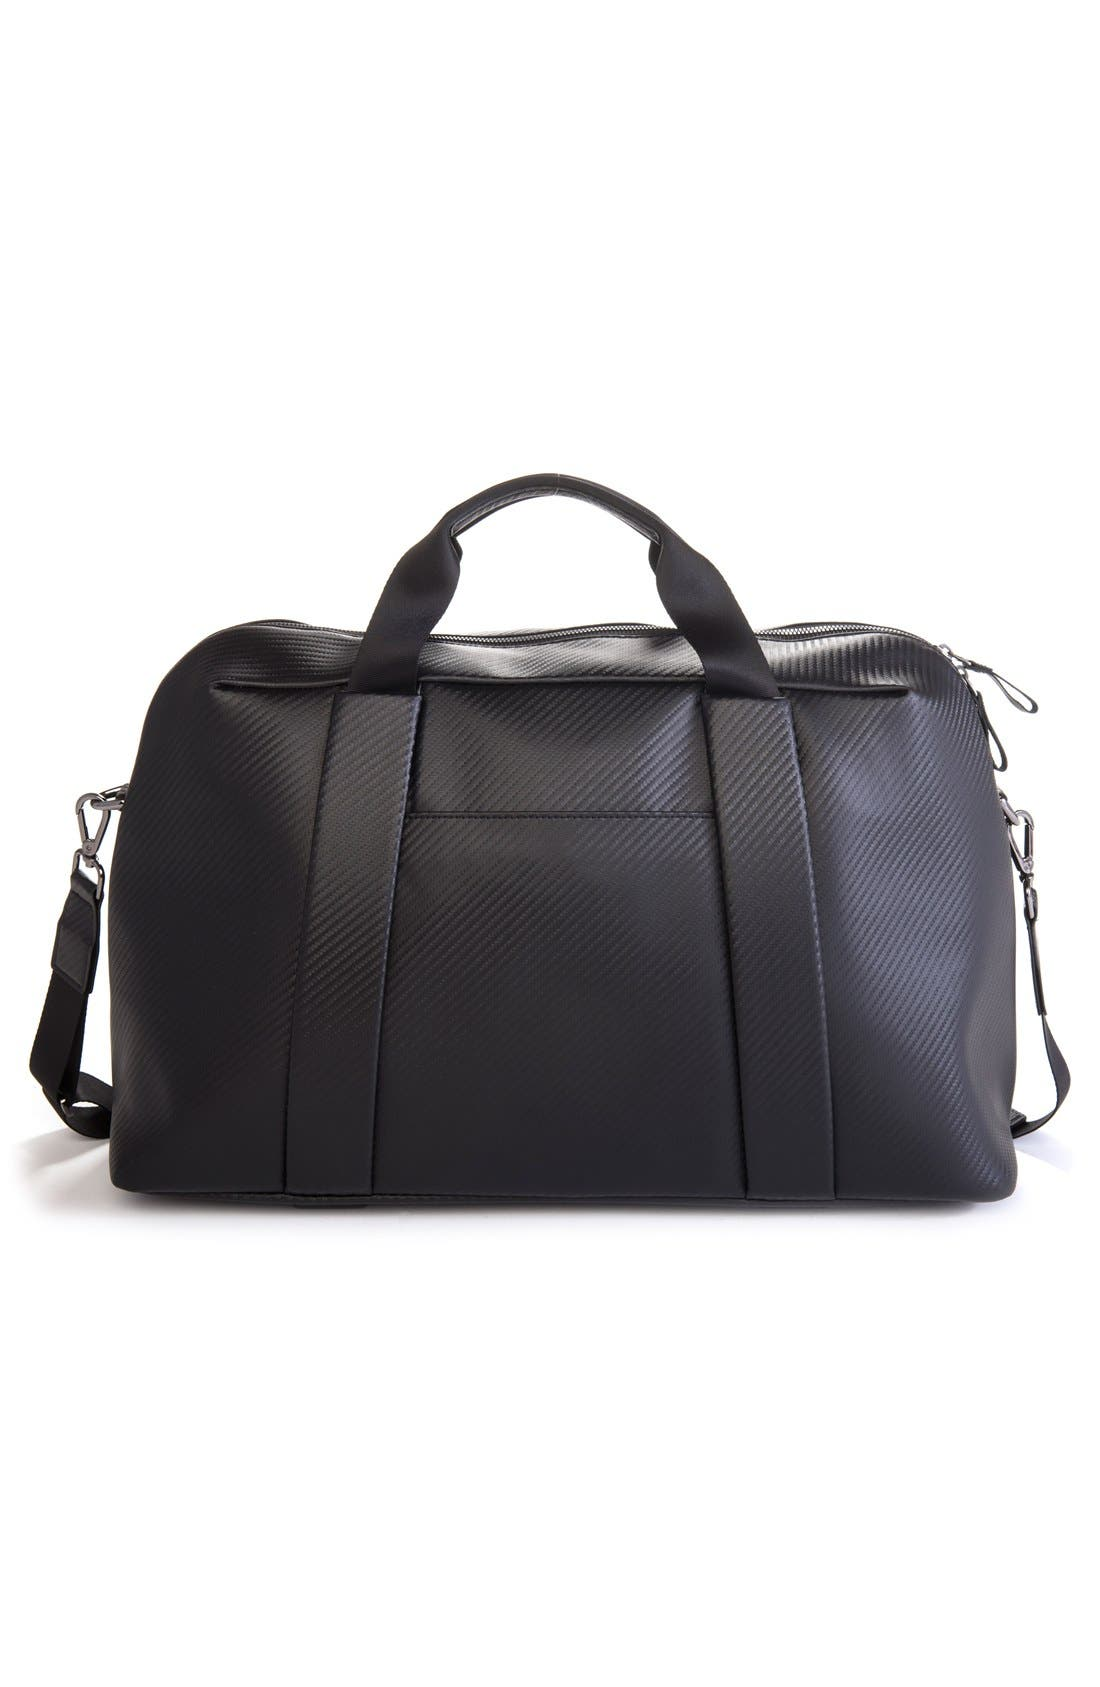 'Signature' Large Duffel Bag,                             Alternate thumbnail 5, color,                             CARBON BLACK